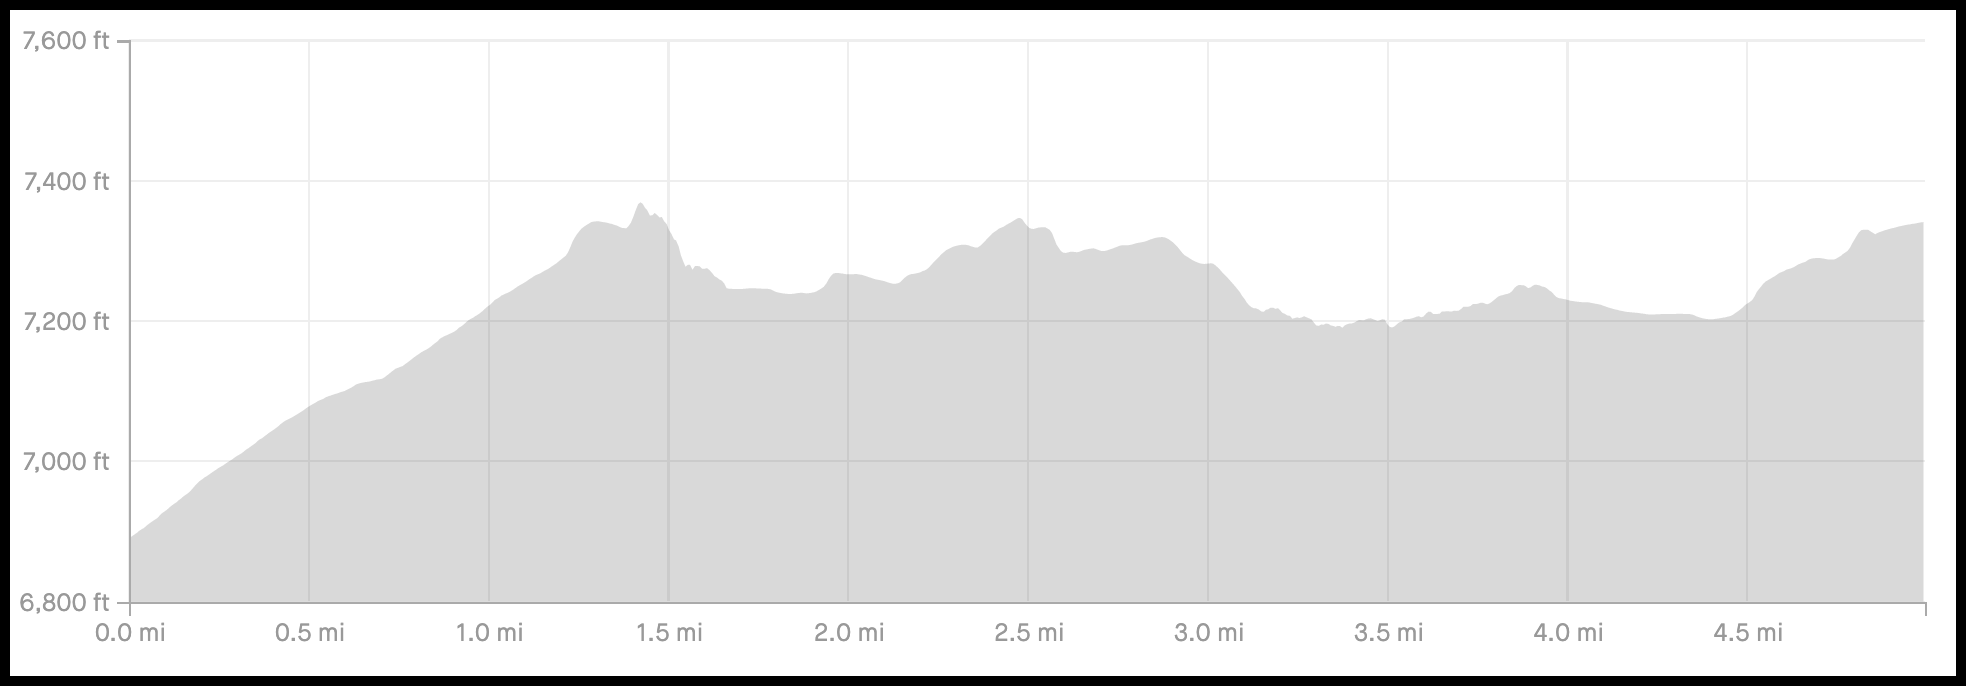 Backpacking the Skoki Loop Trail - Day 2 Elevation Profile